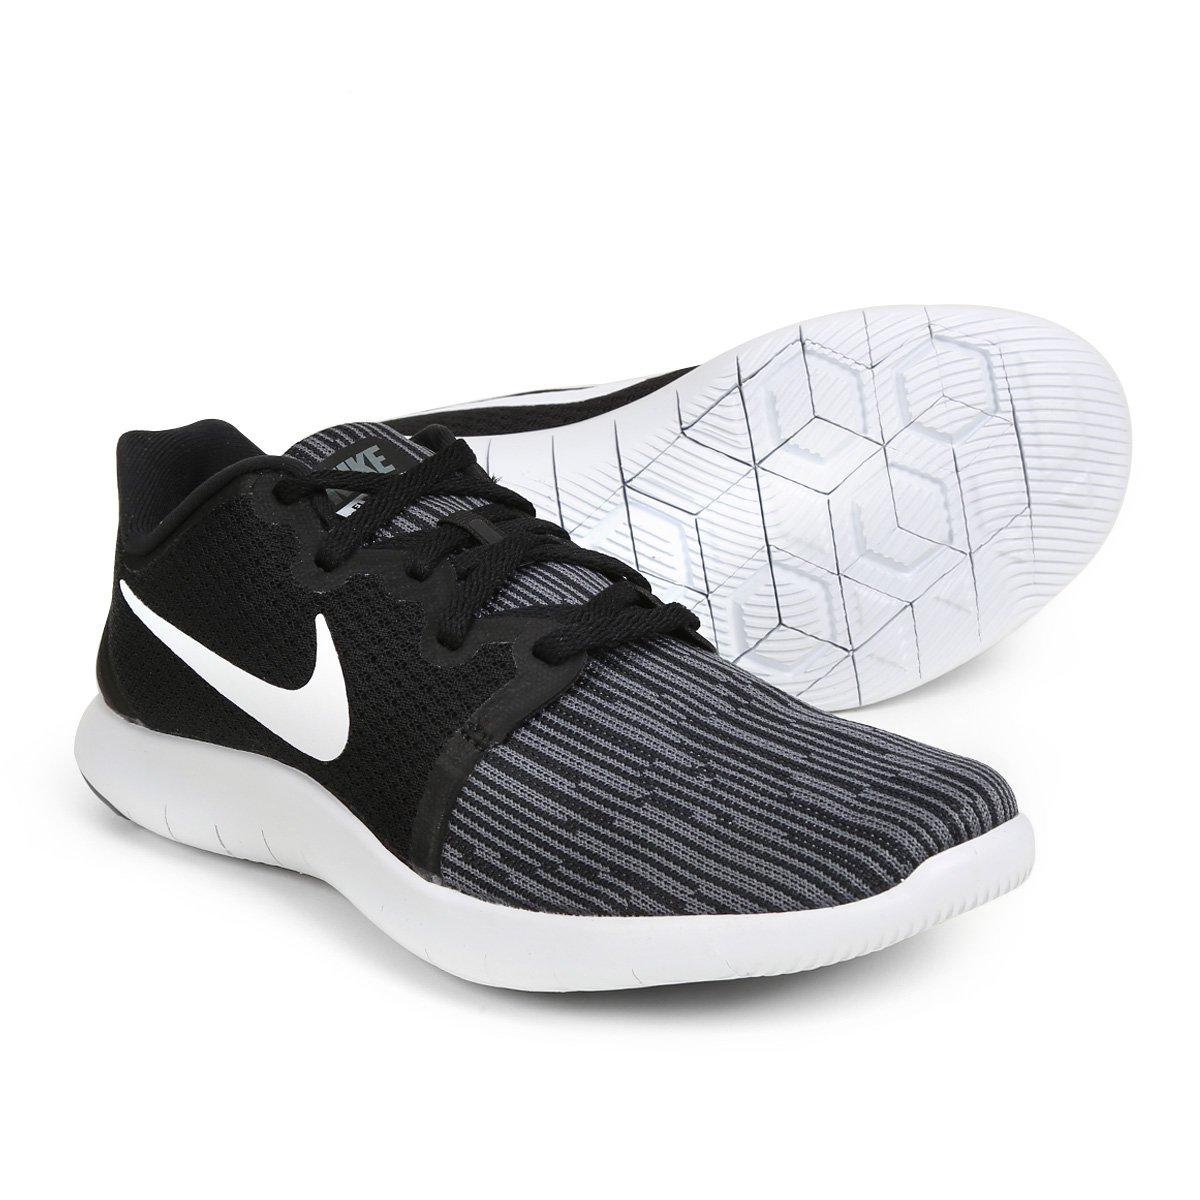 ac084bc9b95a62 Tênis Nike Flex Contact 2 Feminino - Branco e Preto | Loja do Inter